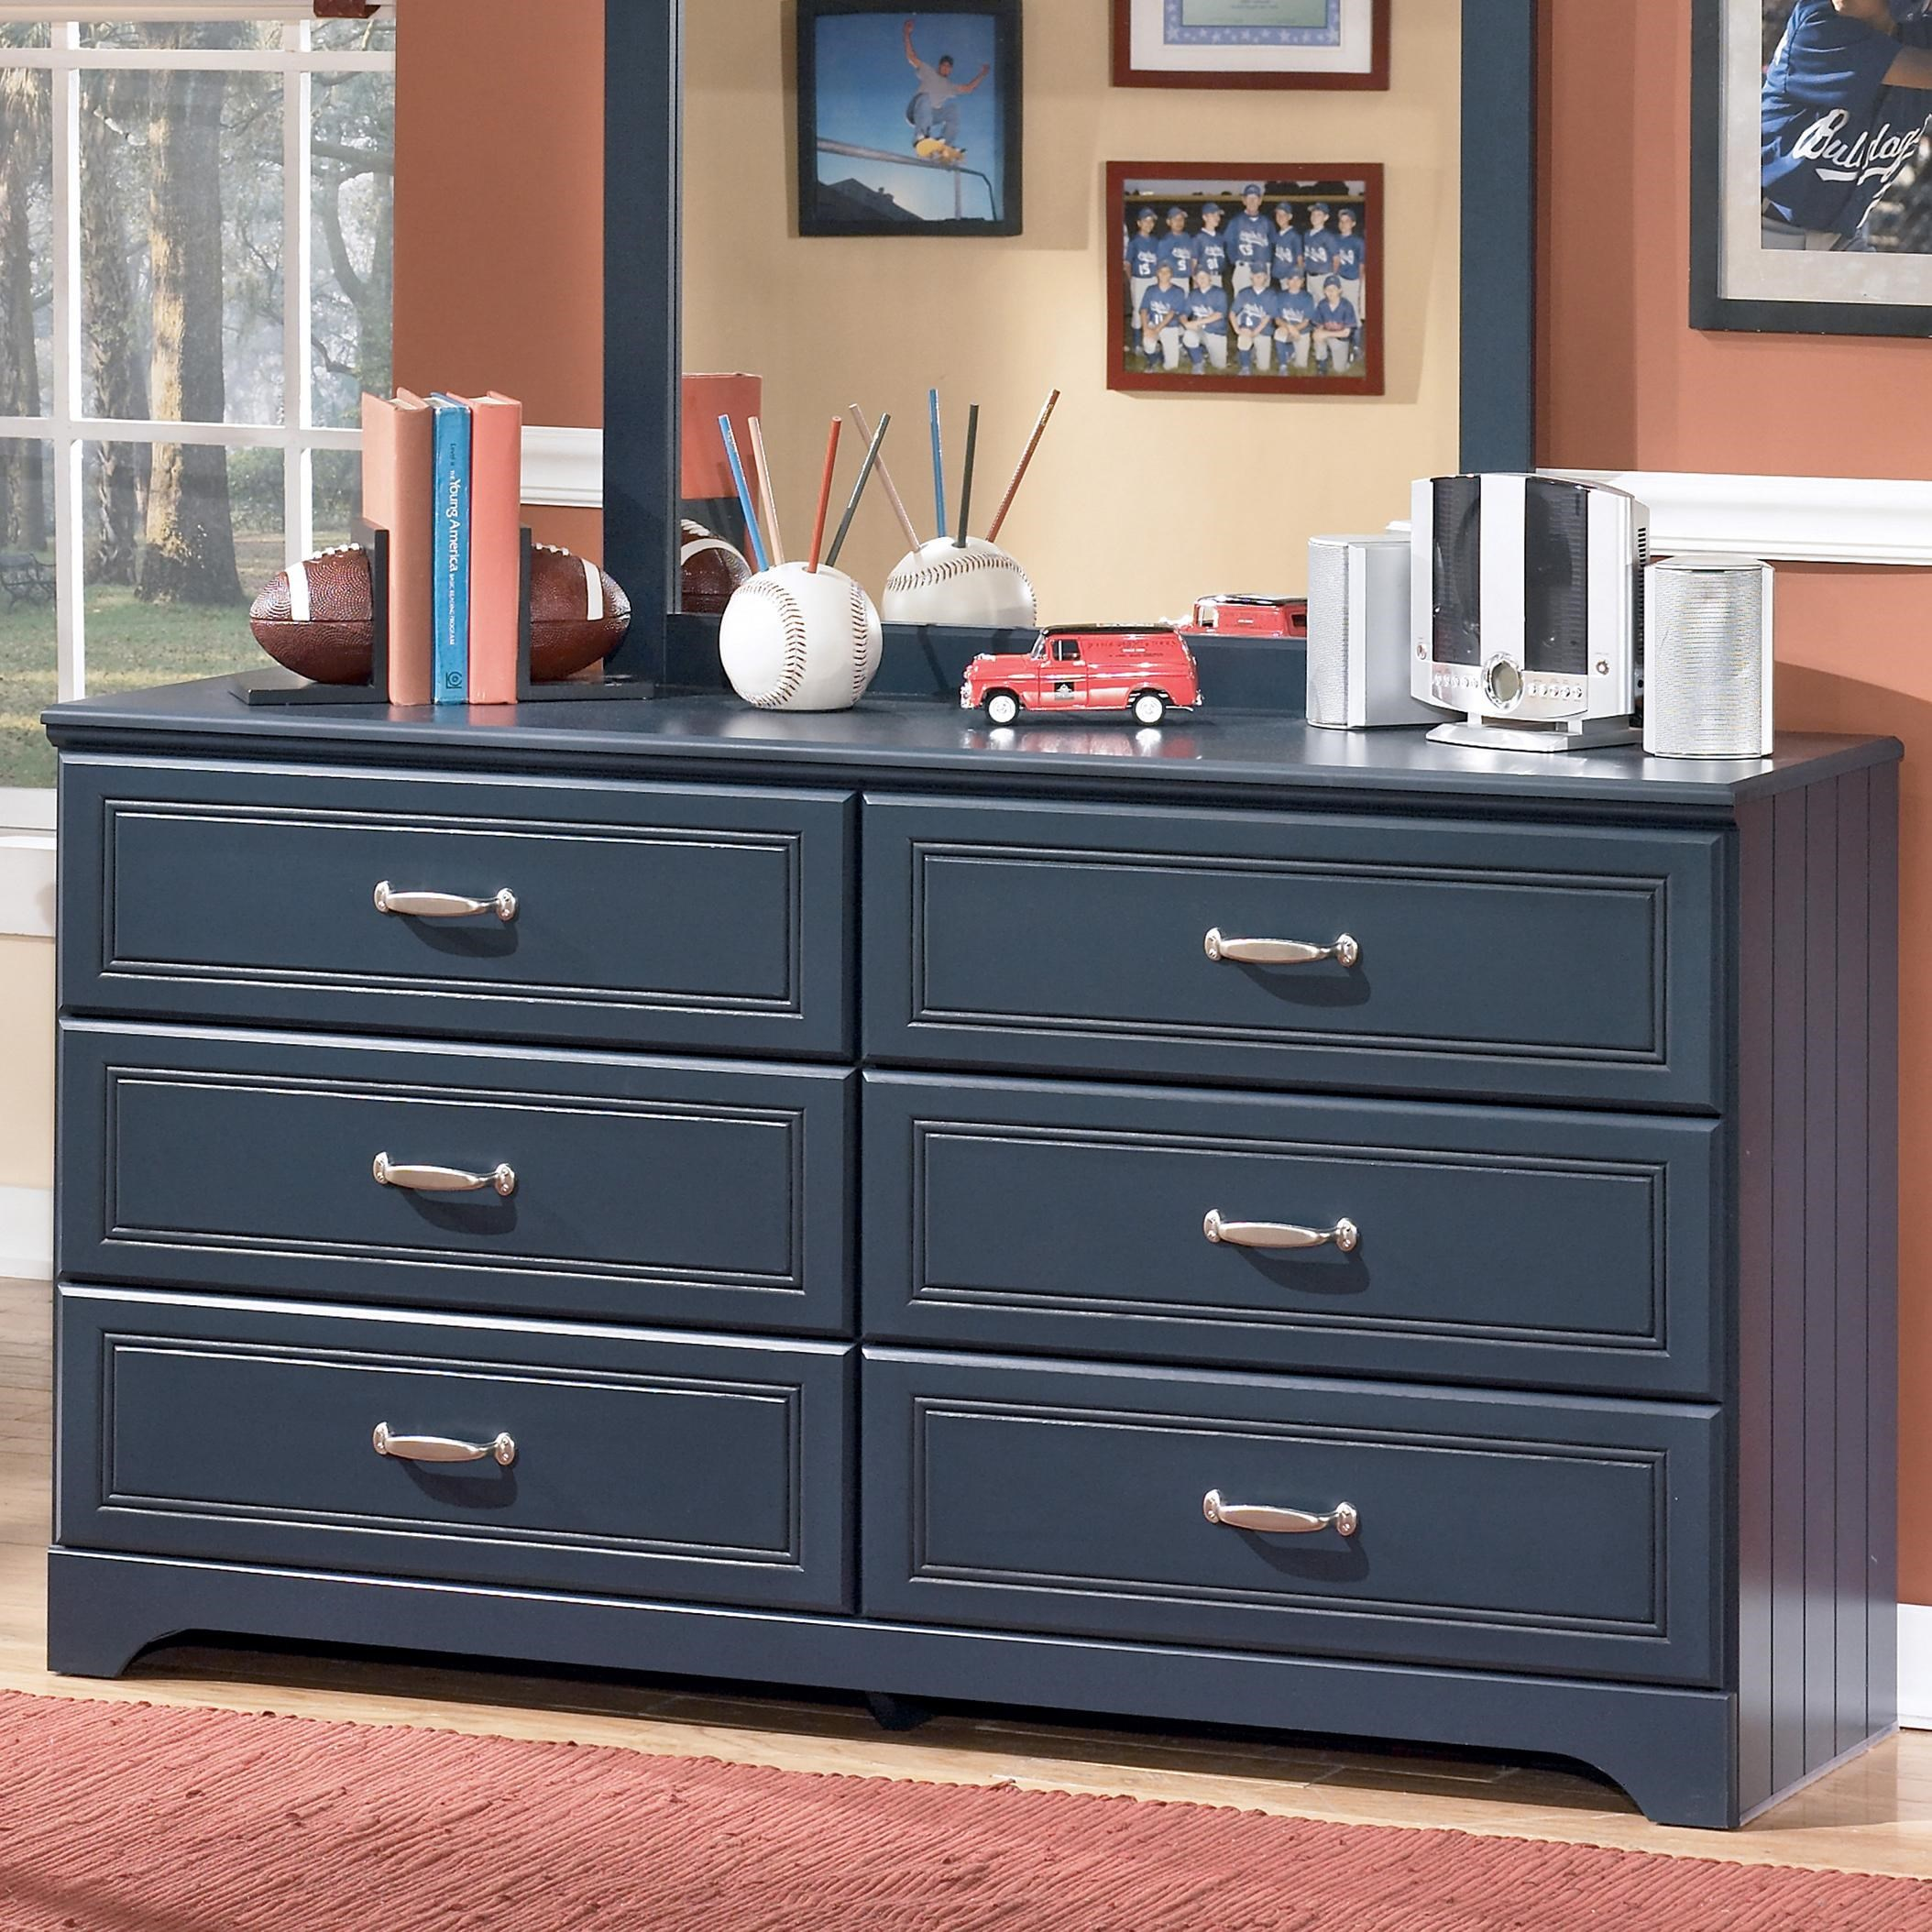 Signature Design By Ashley Leo 6 Drawer Dresser